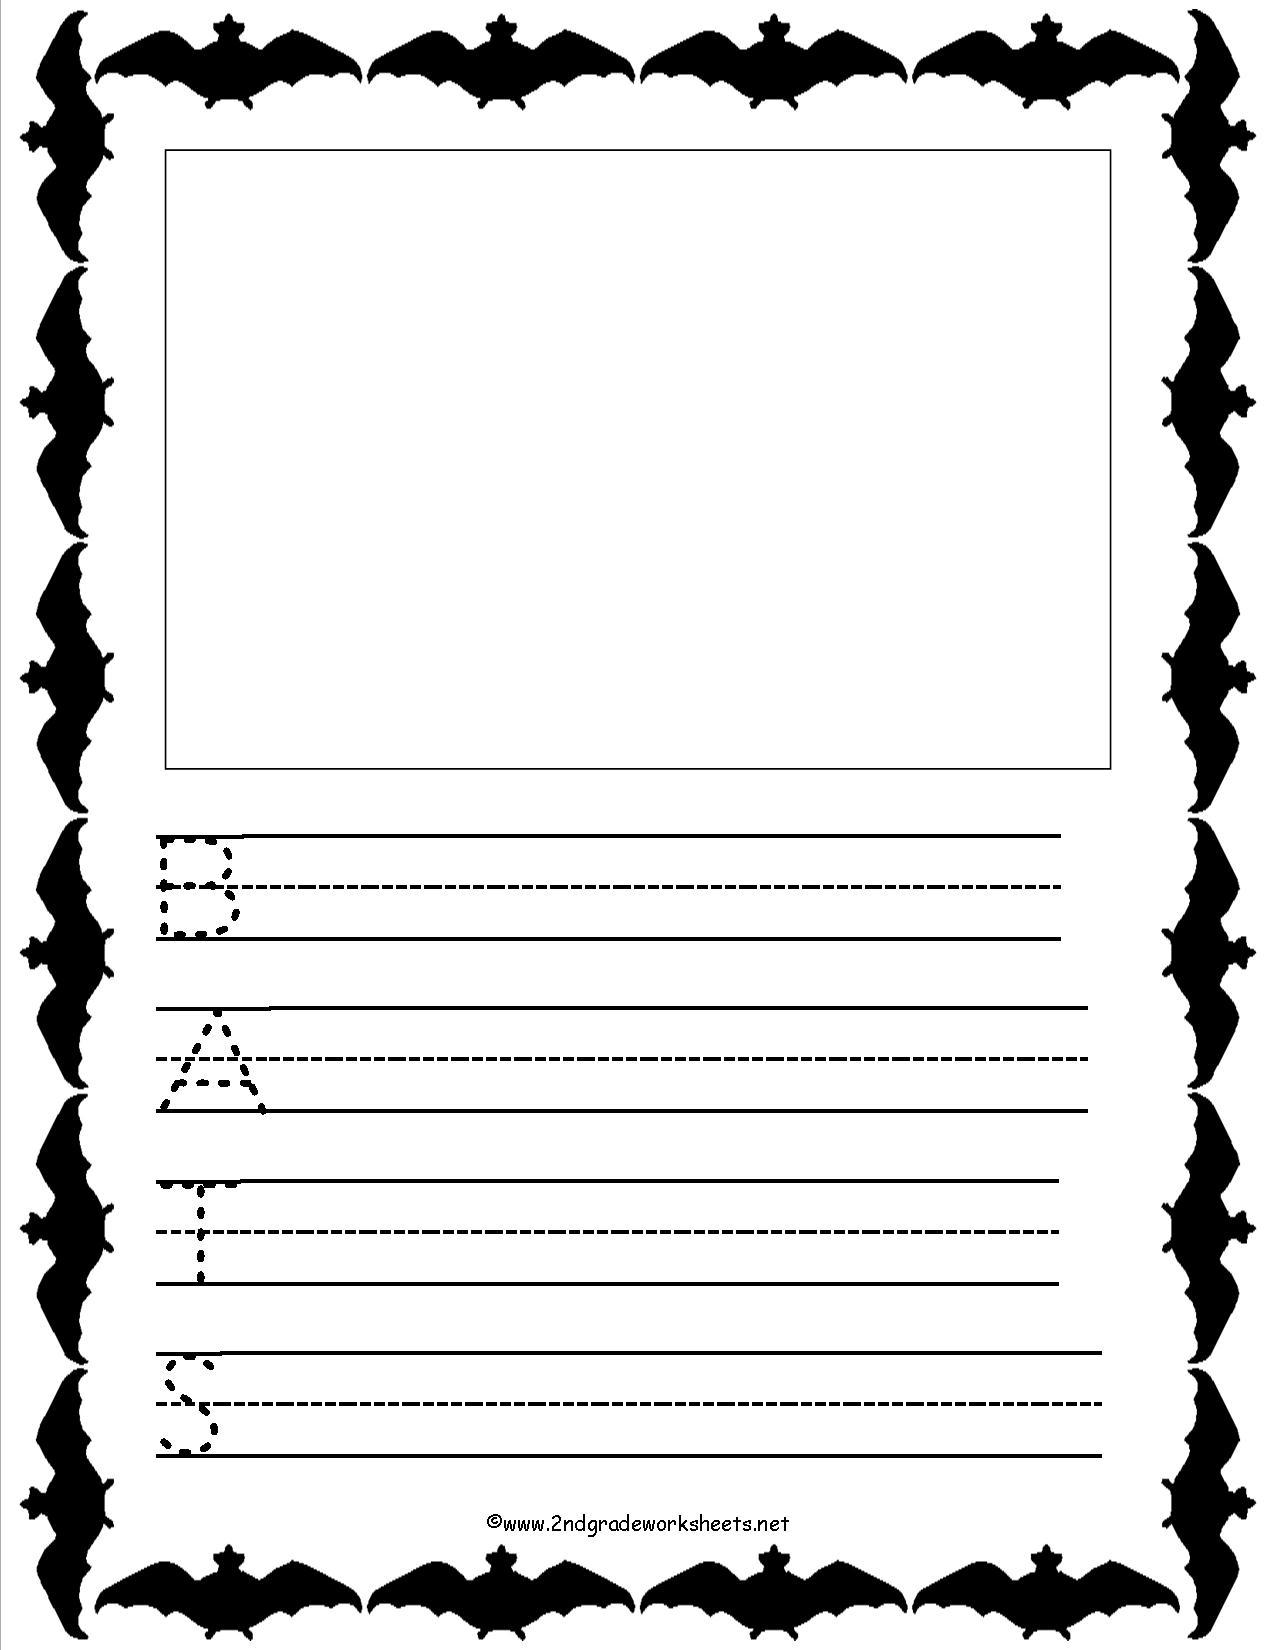 Fourth Grade Reading Writing Worksheets Acrostic Poem